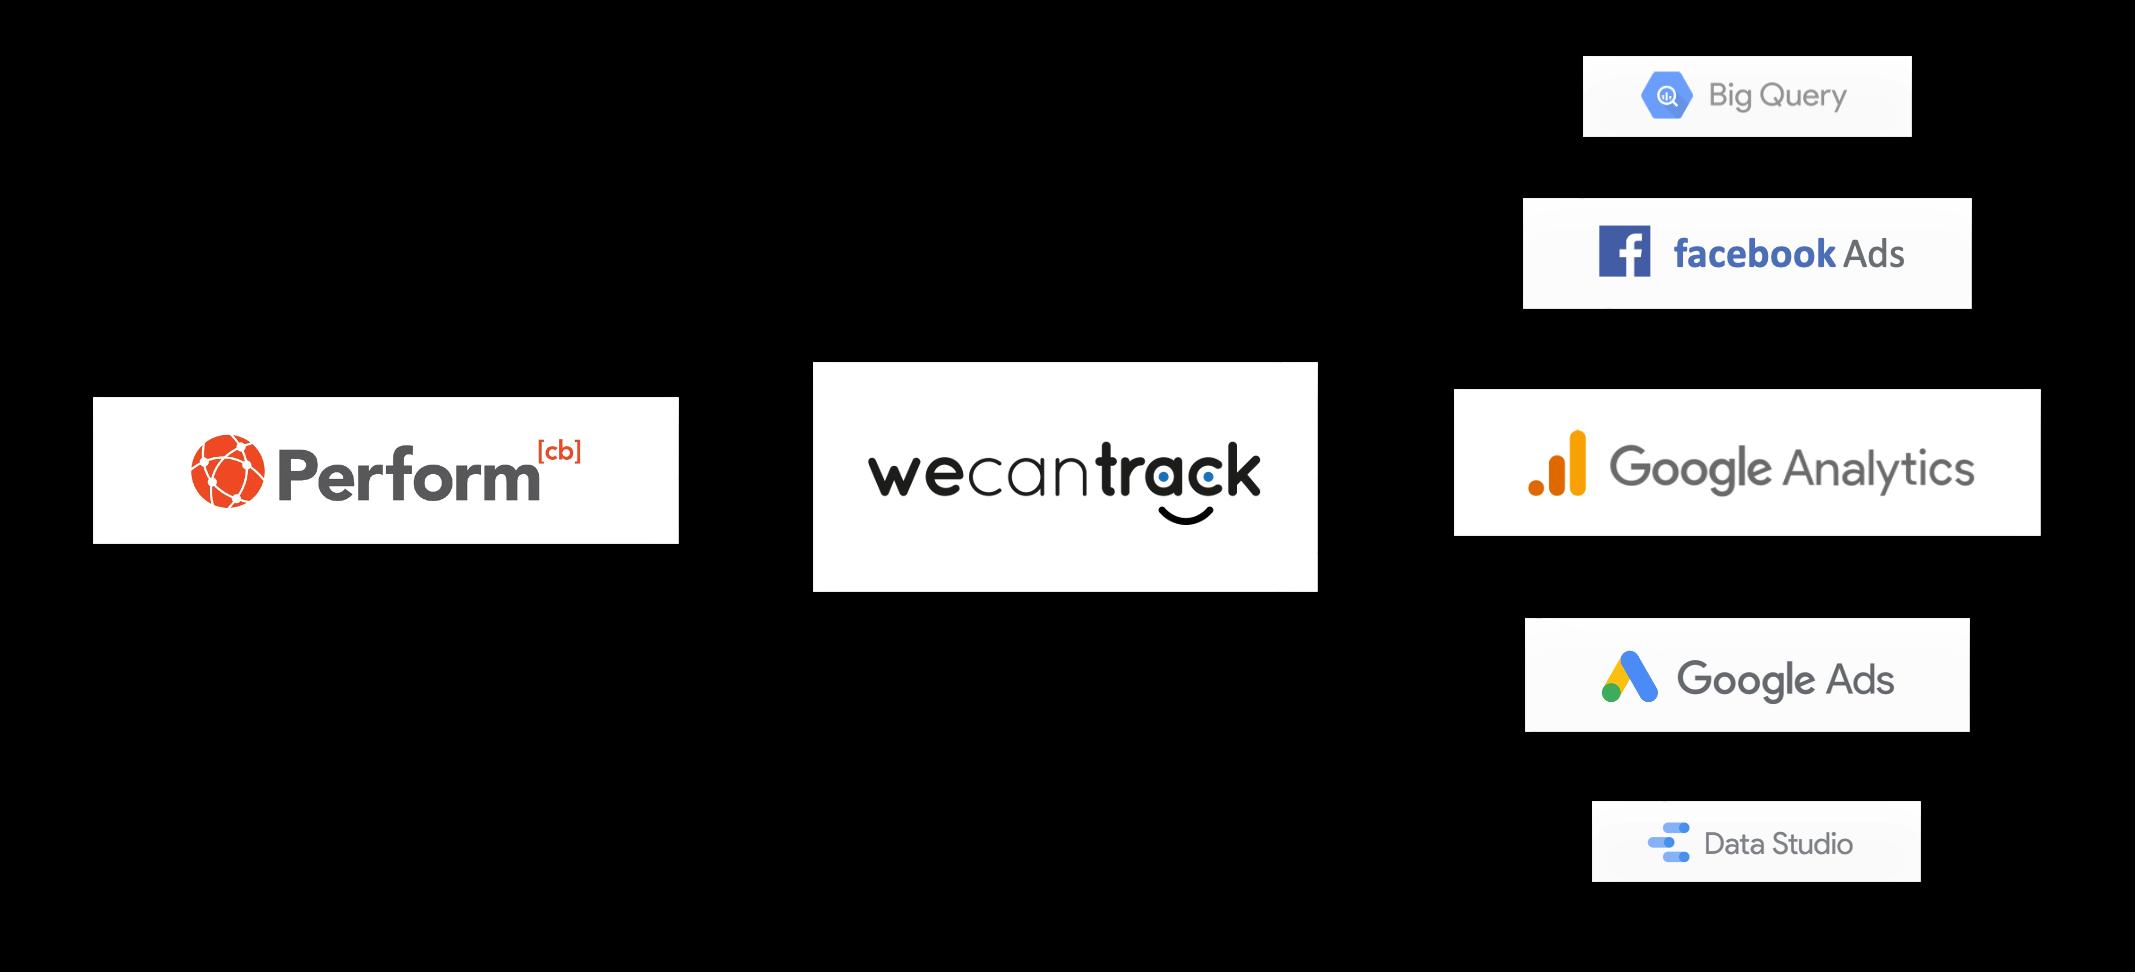 performcb-affiliate-conversion-integration-via-postback-url